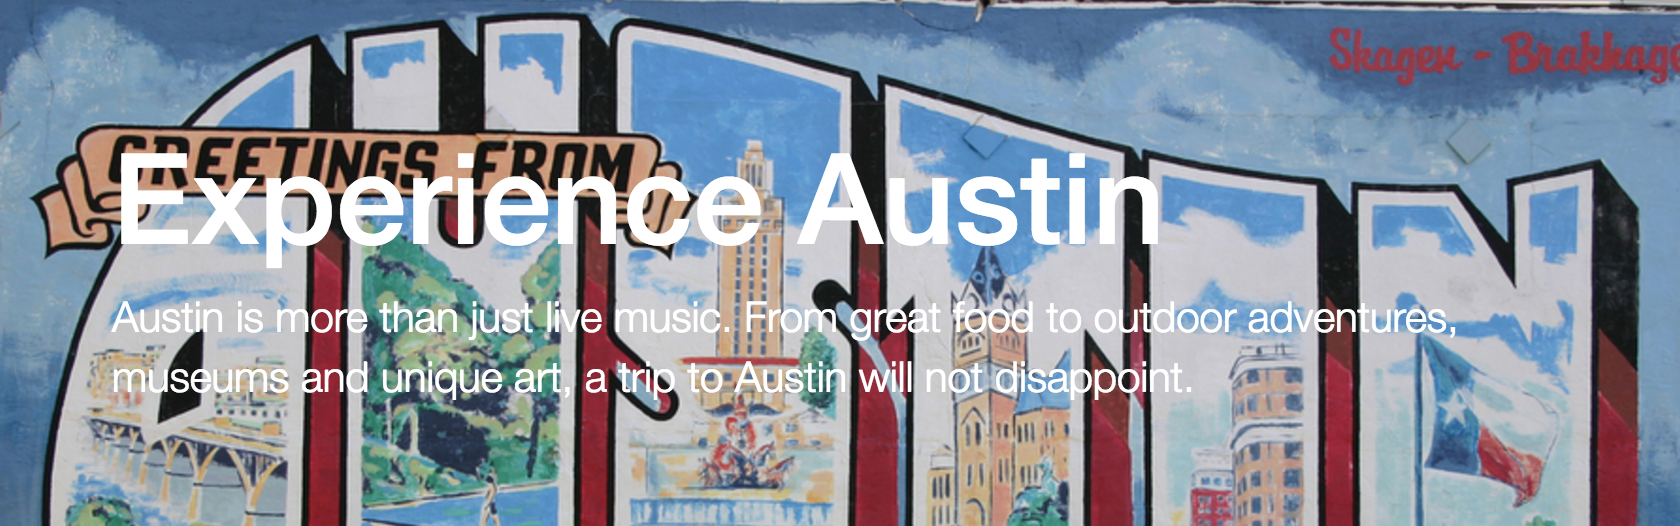 Experience Austin image